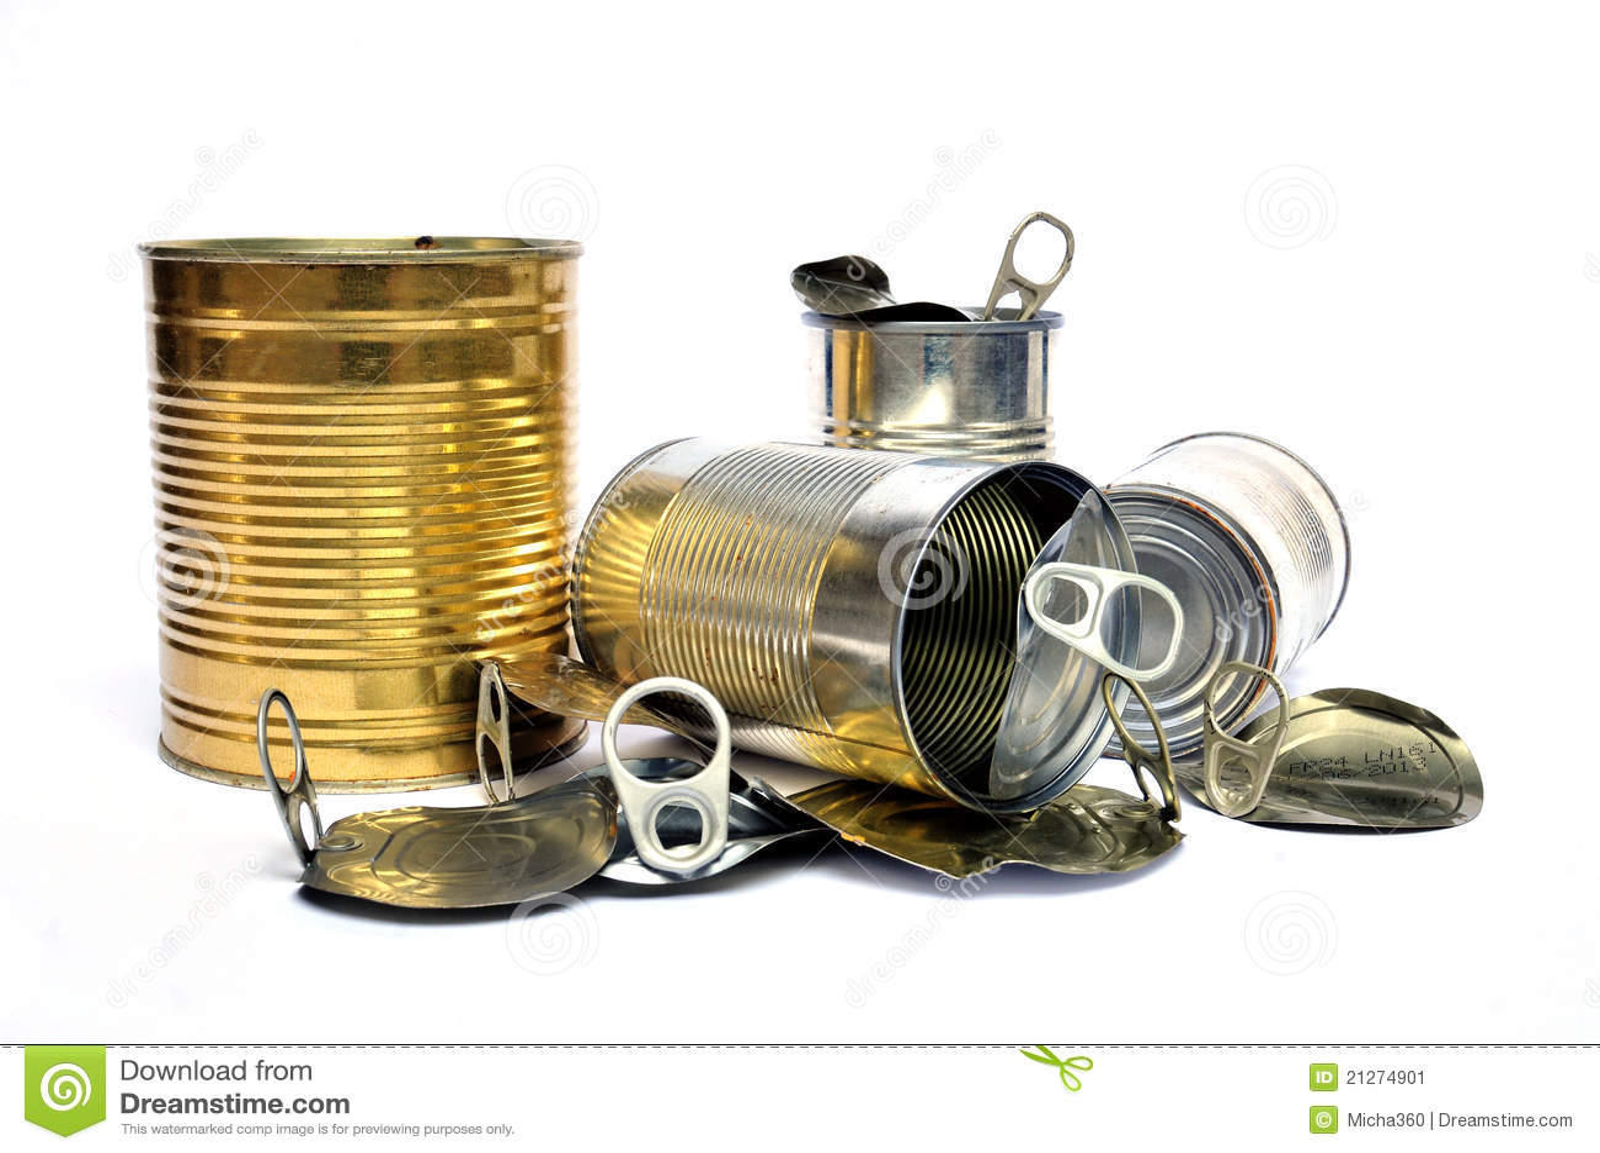 Reciclaje de objetos imagen de archivo imagen de esta os 21274901 - Objetos de reciclaje ...